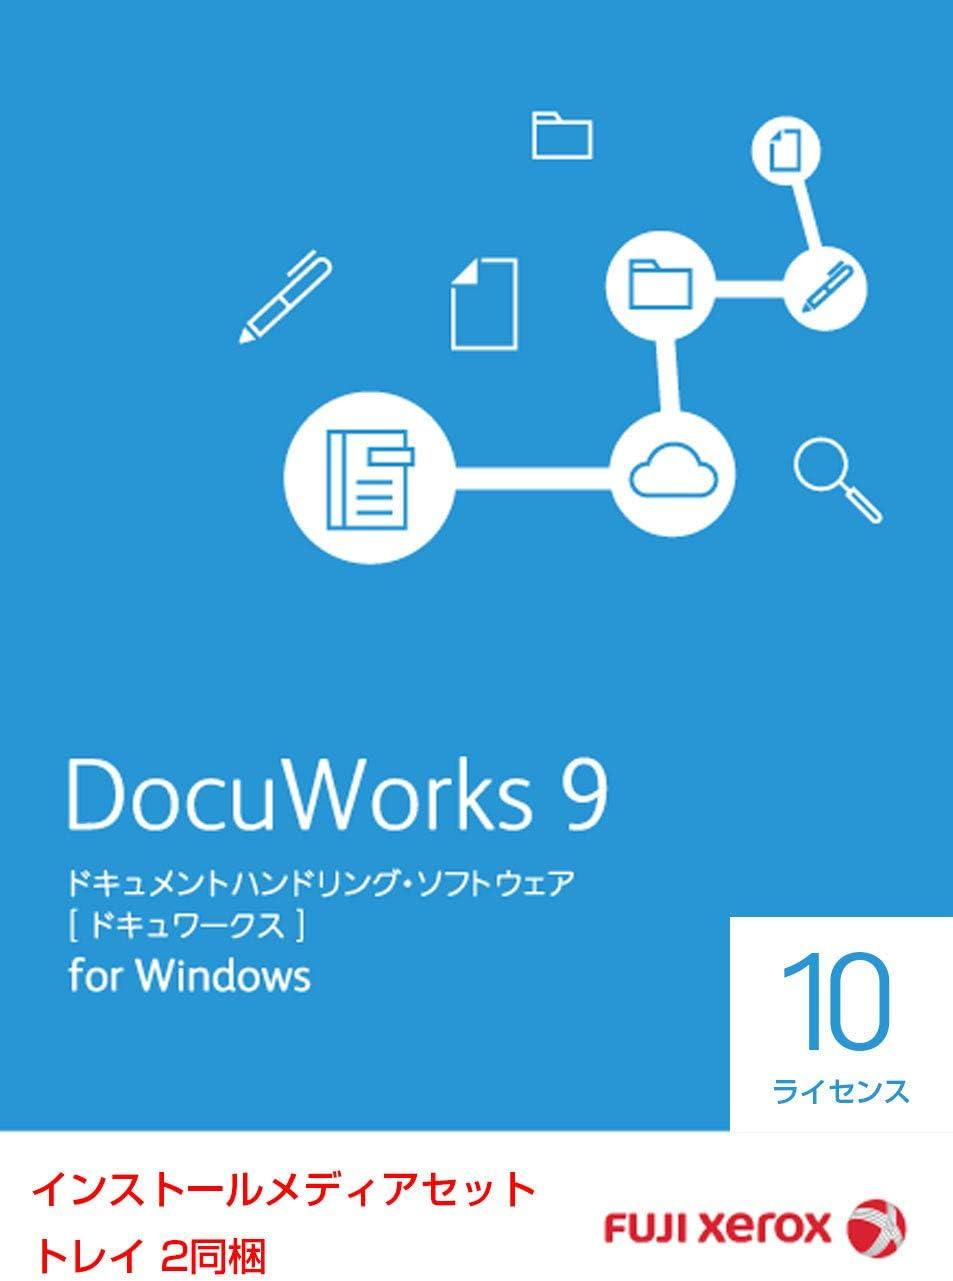 DocuWorks 9 ライセンス認証版(トレイ 2同梱)/ 10ライセンス 基本パッケージ